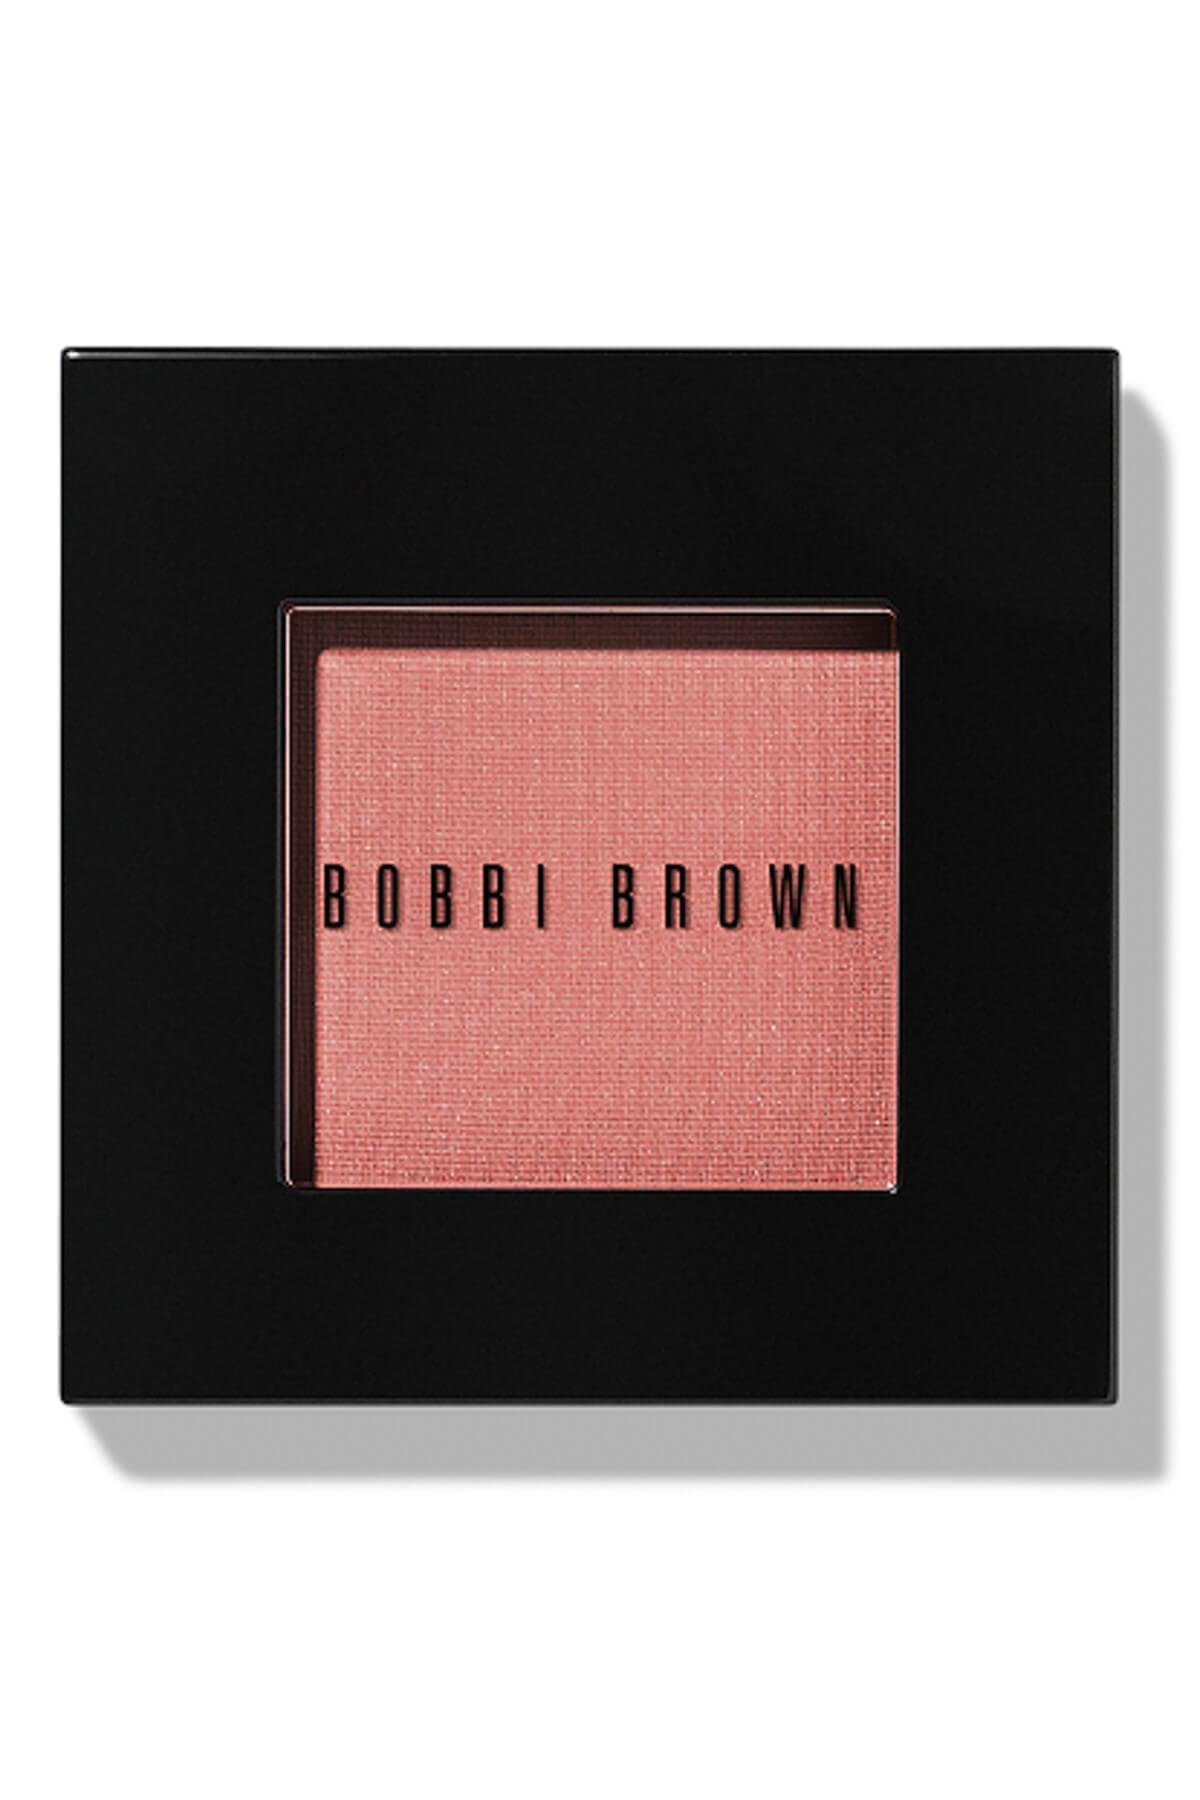 BOBBI BROWN Blush / Allık 3.7 G Tawny 716170059594 1